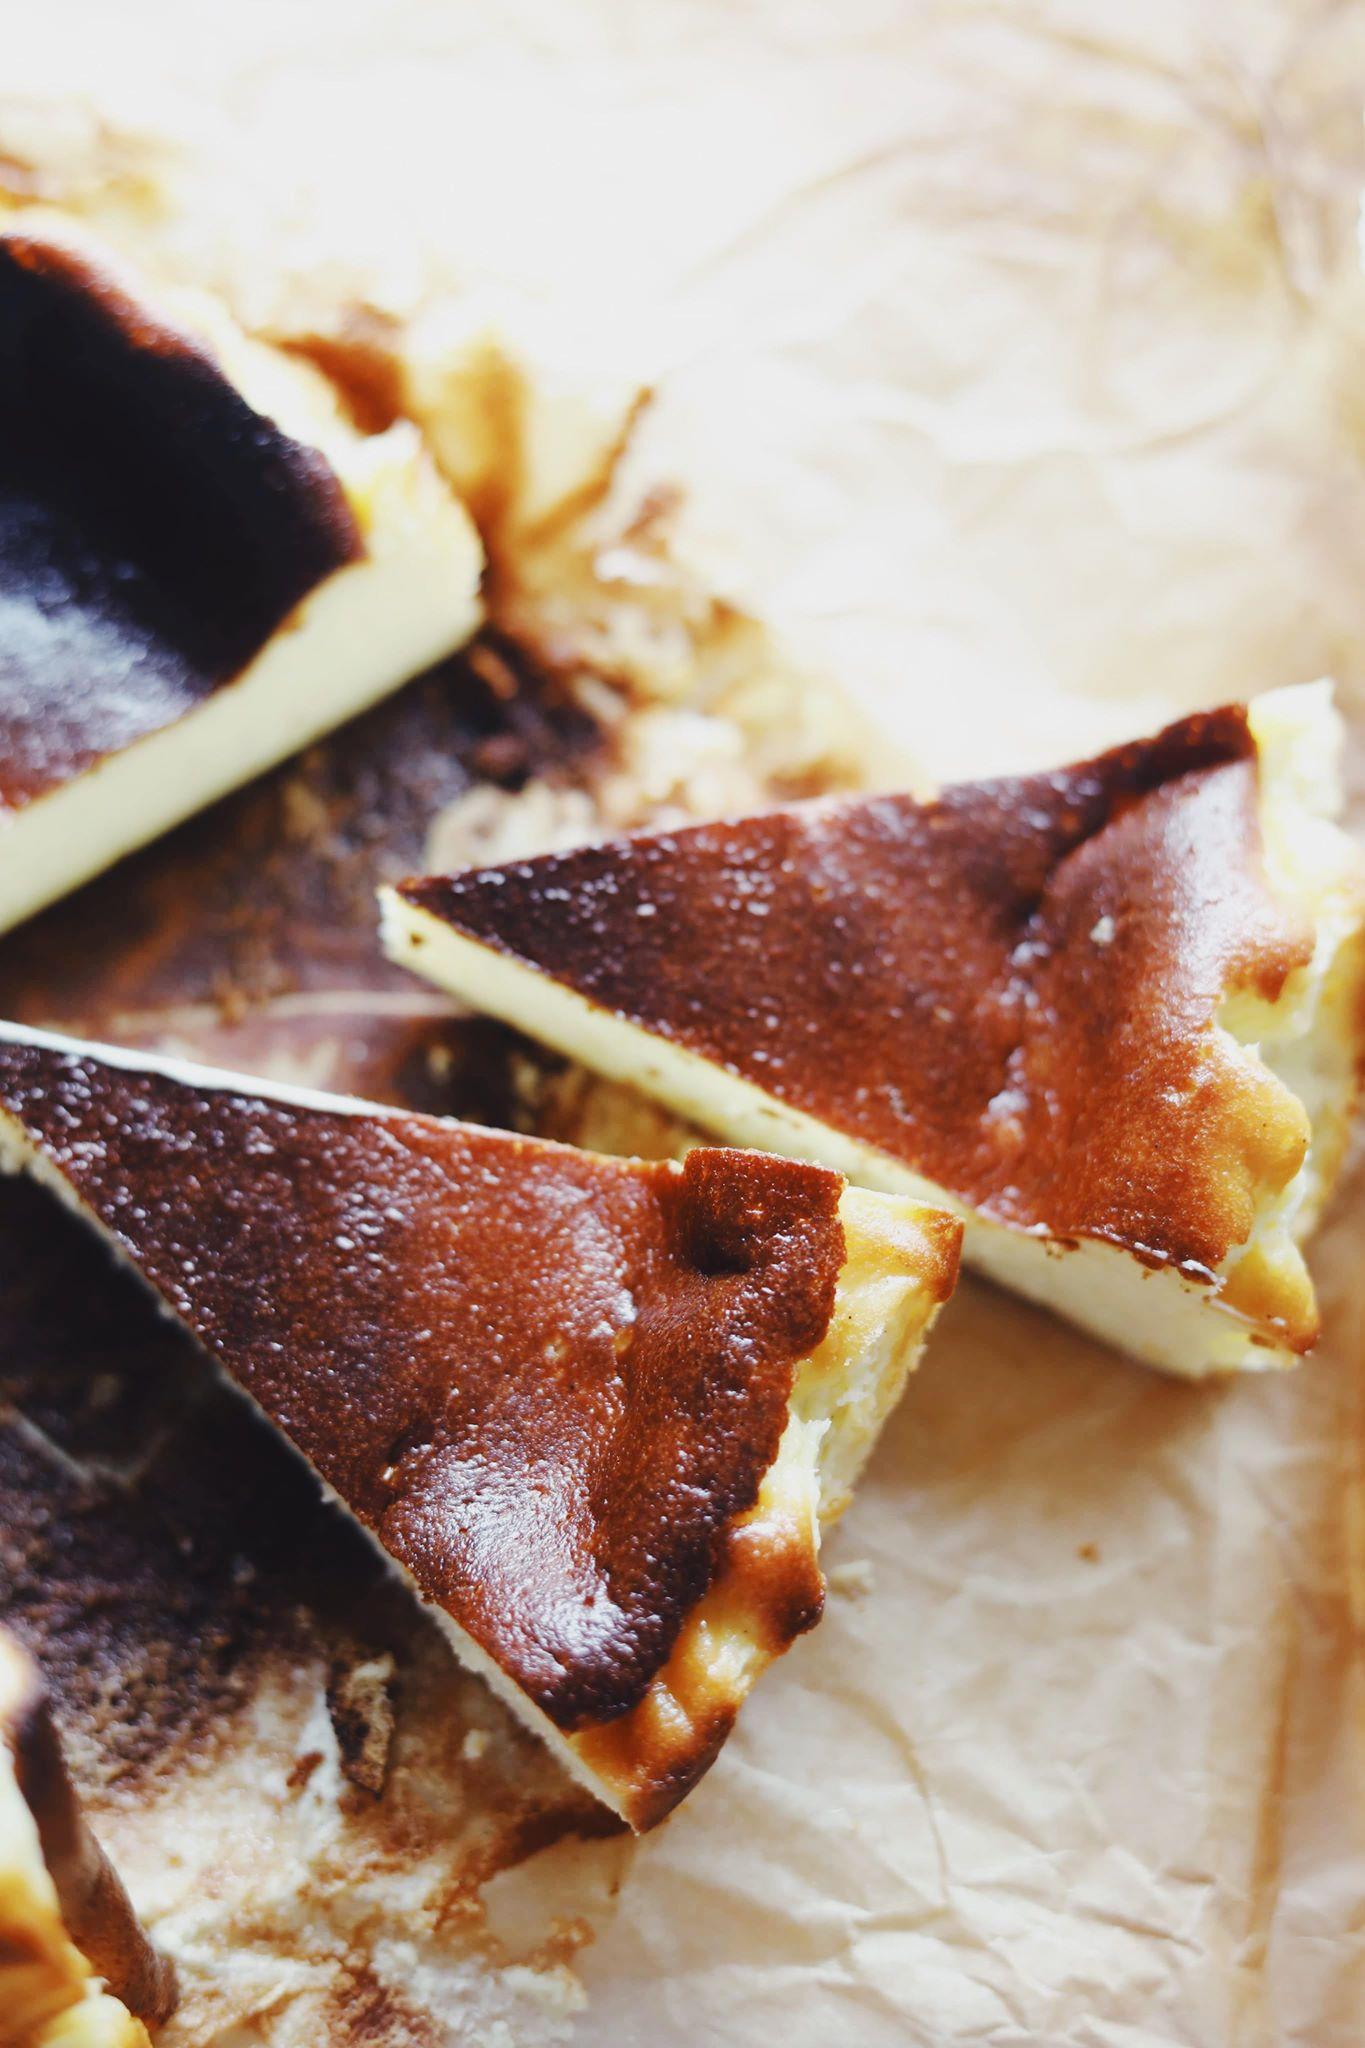 Basque burnt cheesecake (bagt cheesecake)